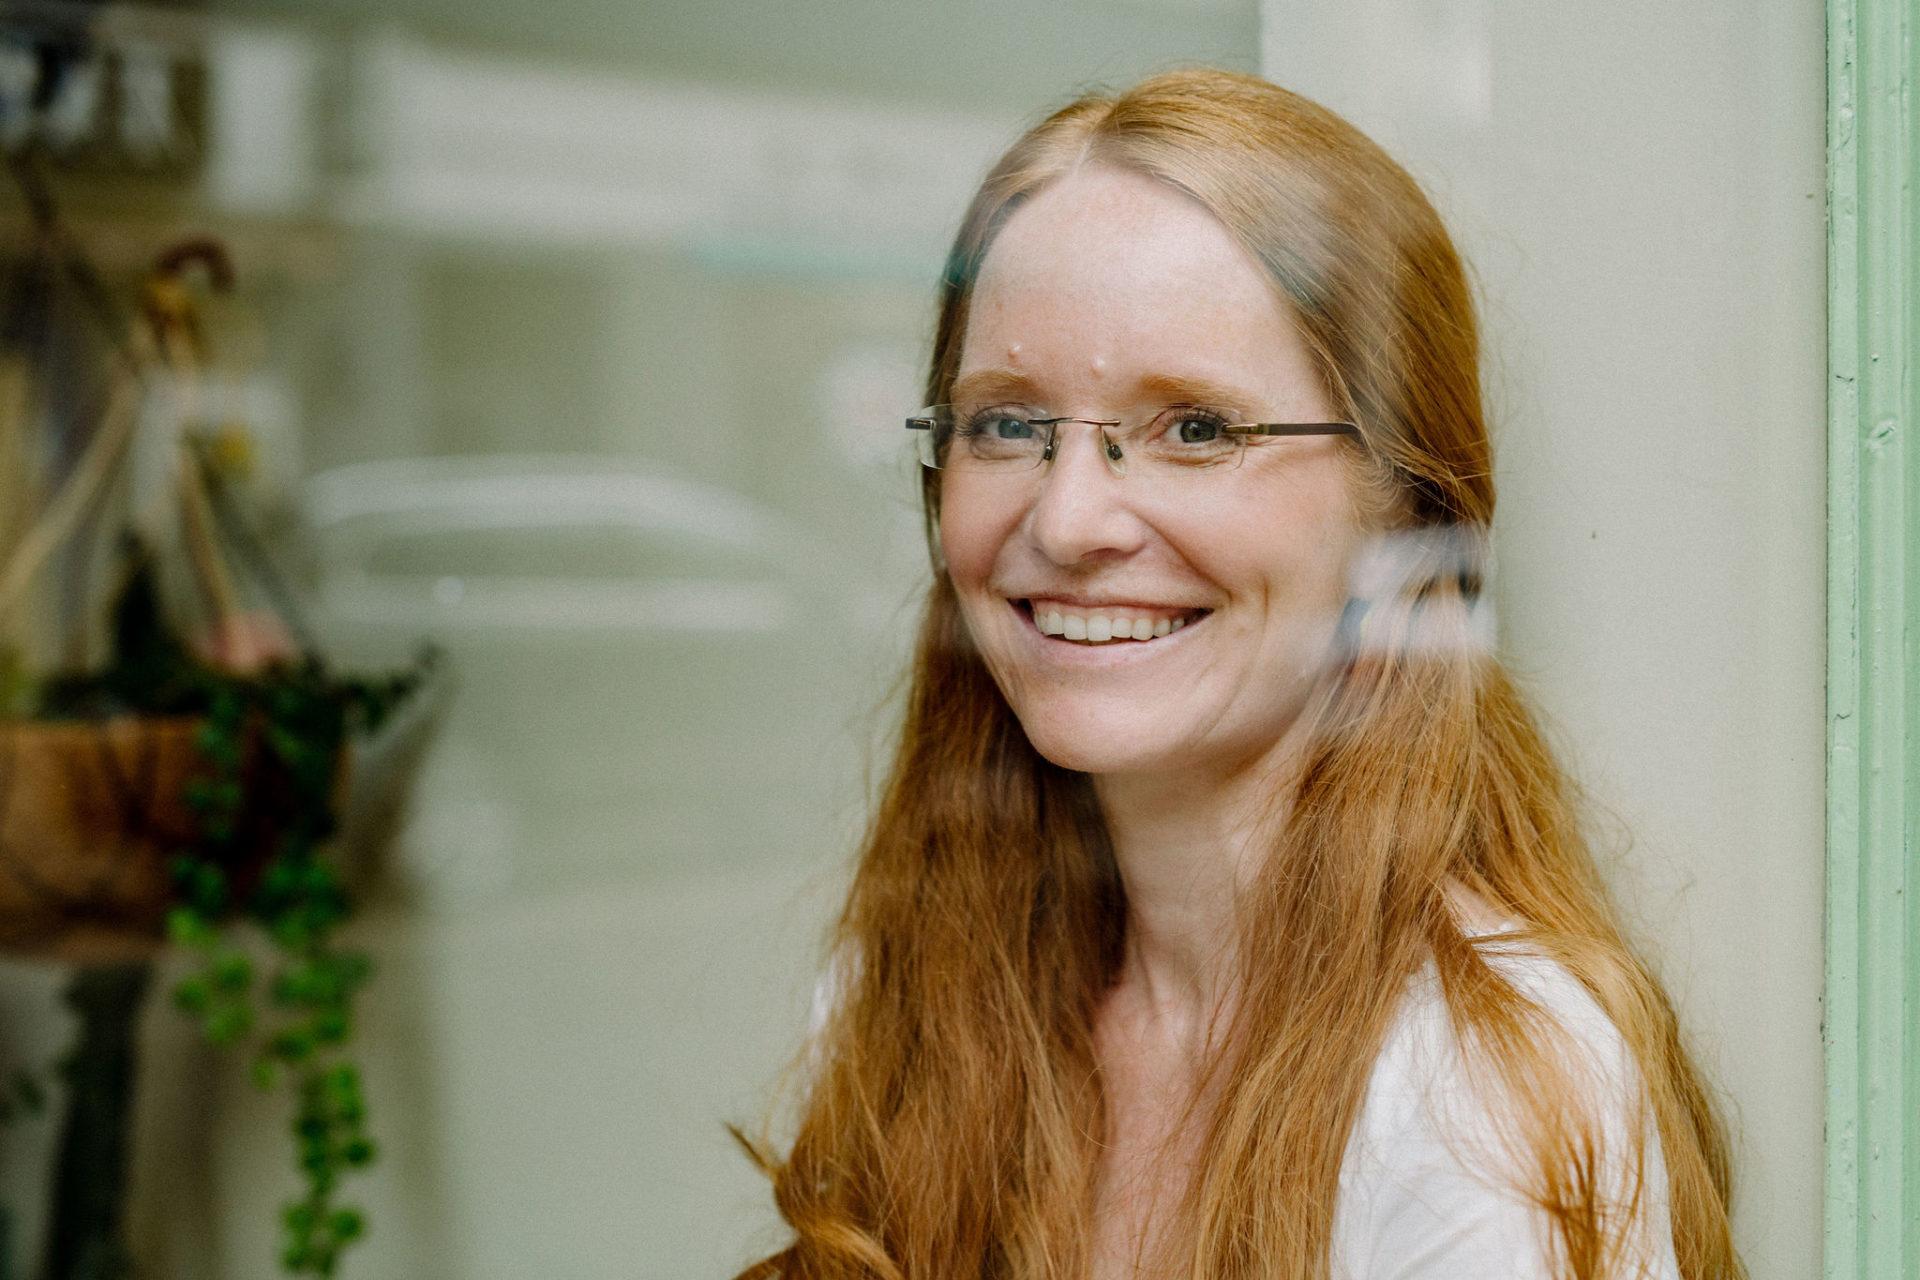 Melanie Knapp Portrait